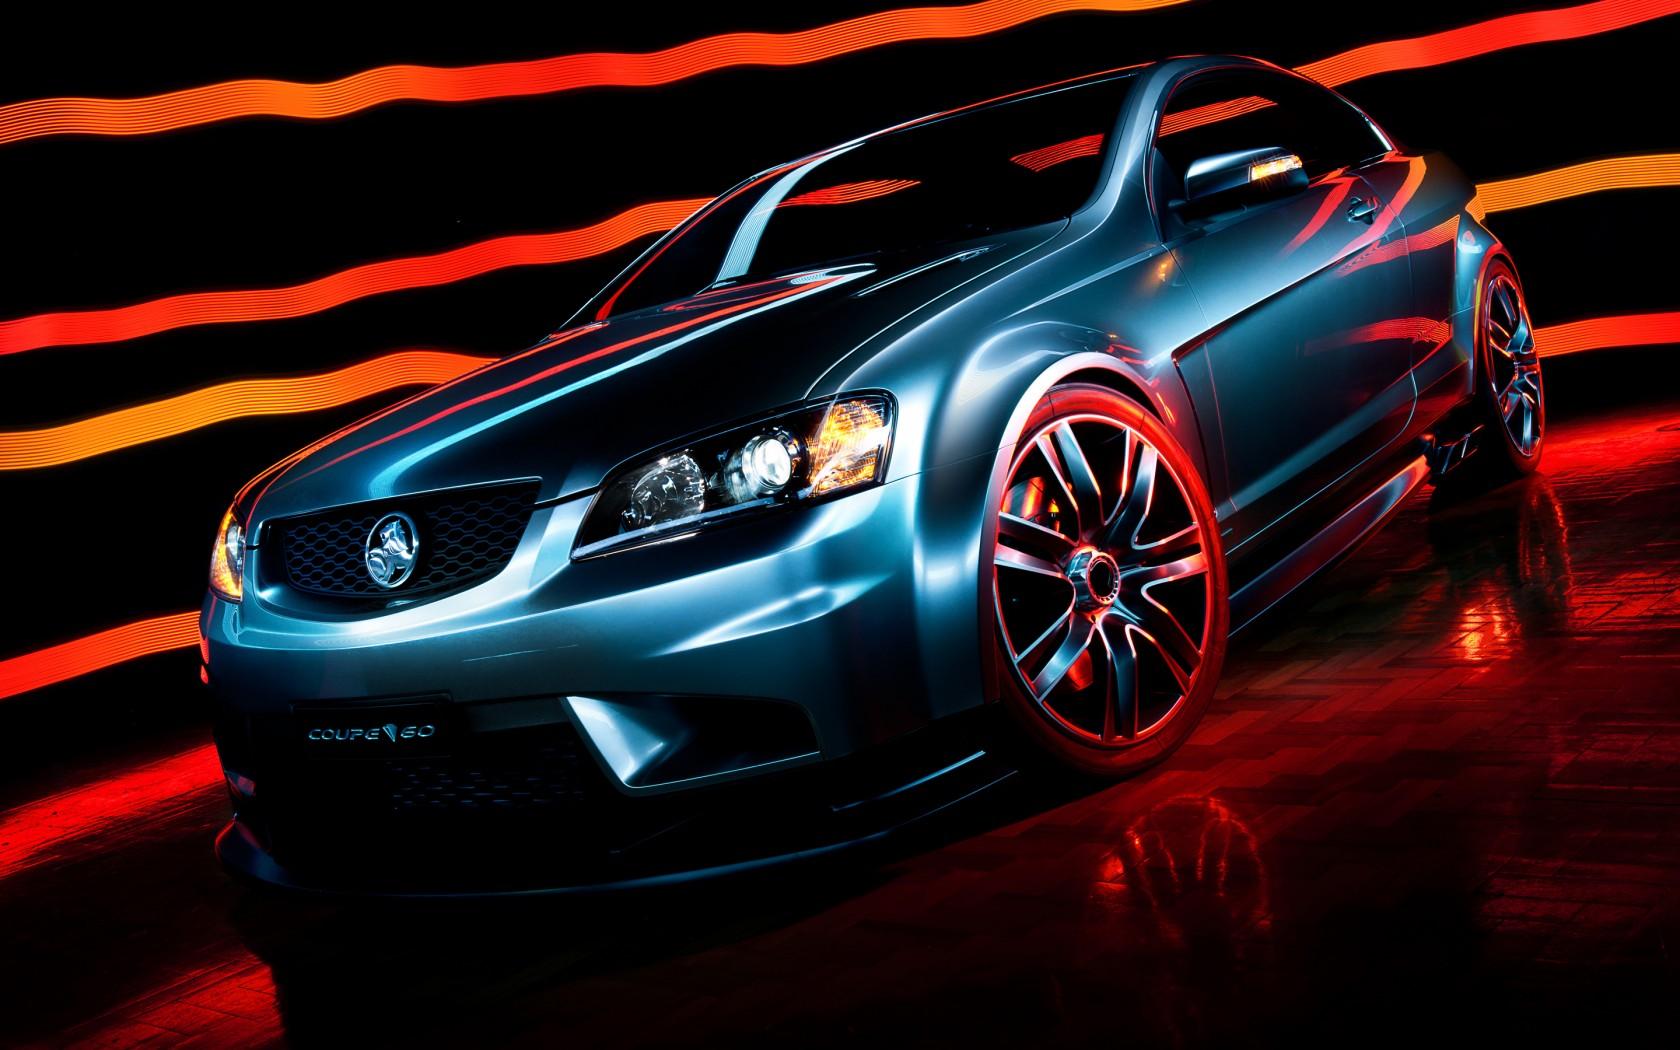 Infiniti Car Logo Wallpaper Holden Coupe 60 Concept Wallpaper Hd Car Wallpapers Id